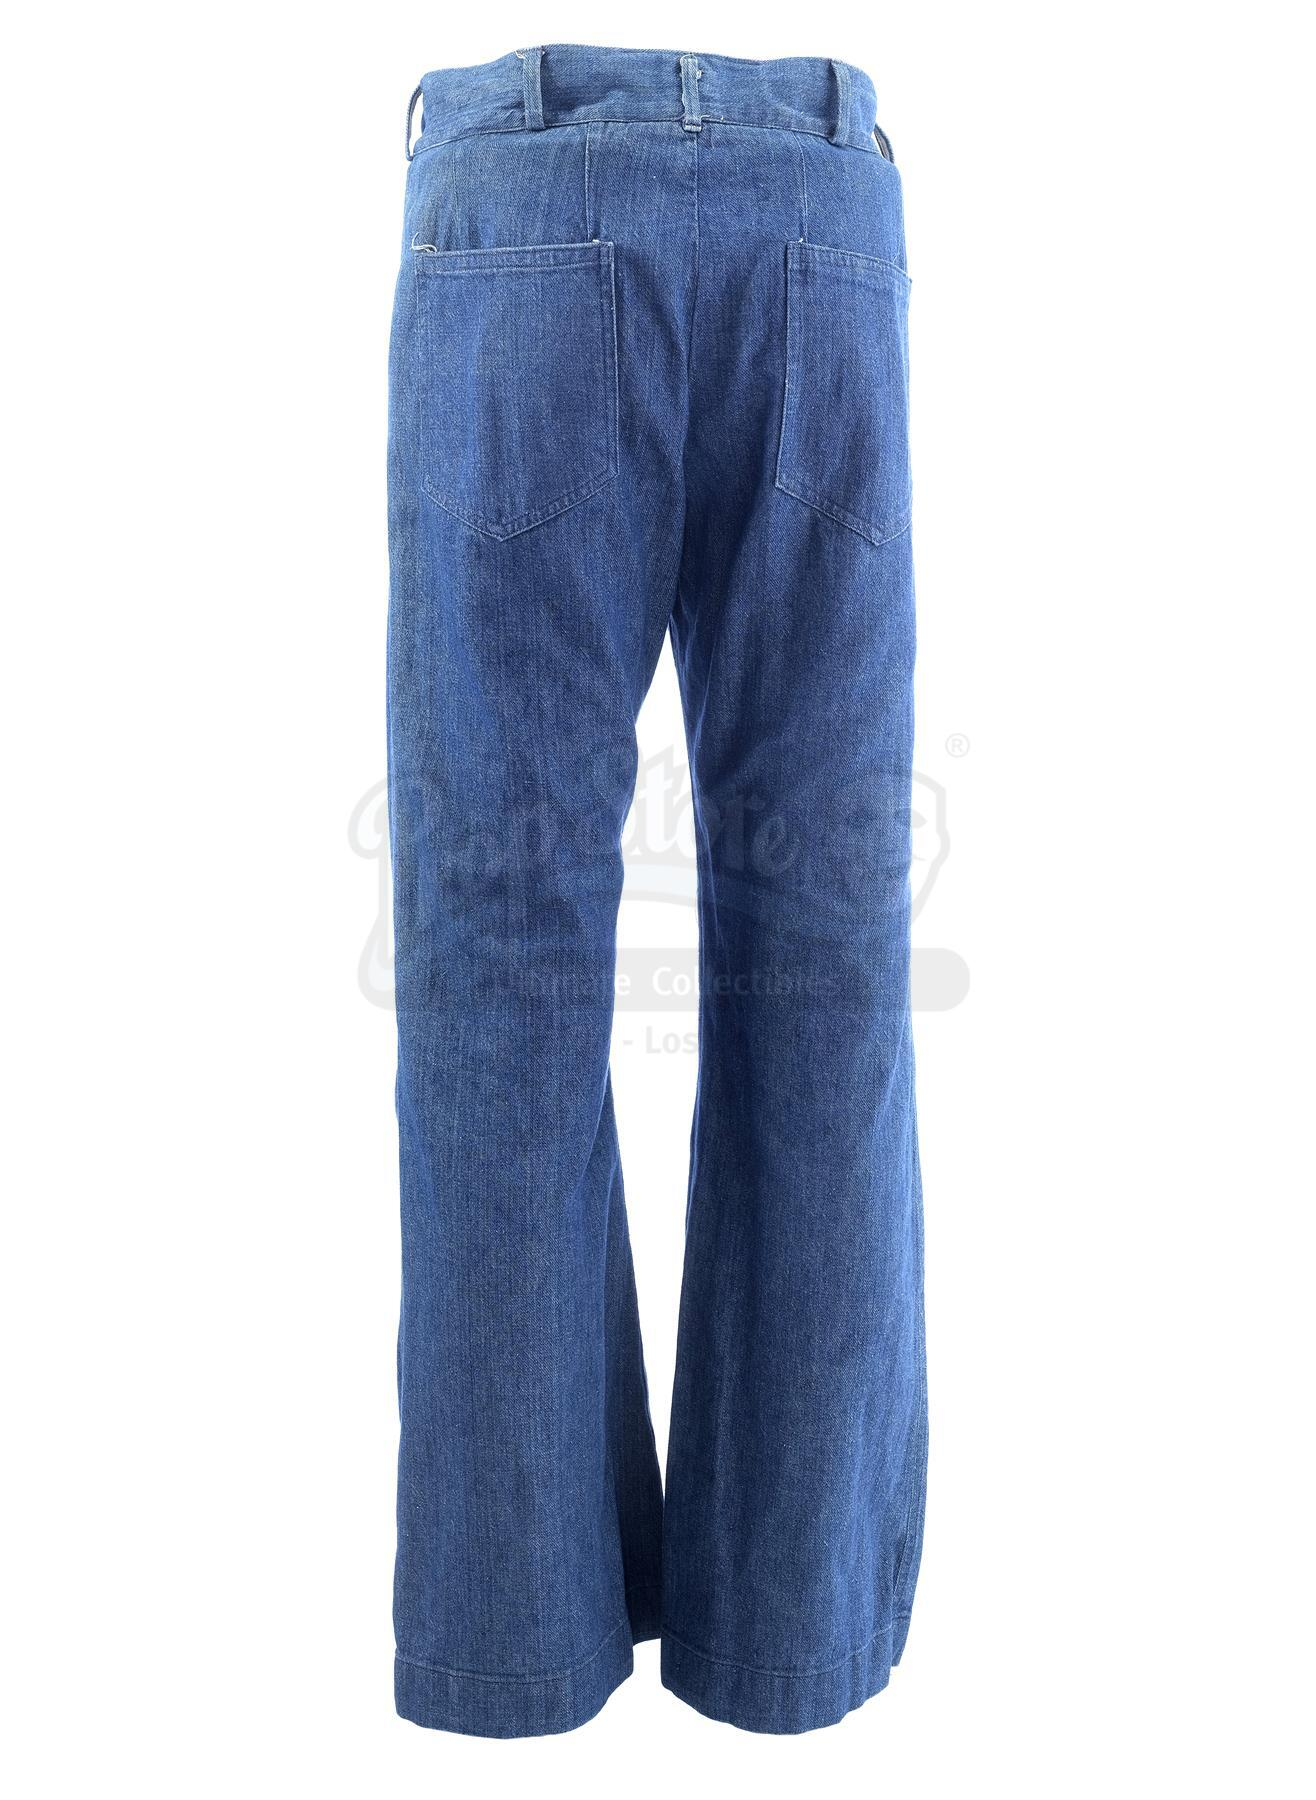 Lot # 1005: THE SAND PEBBLES - Jake Holman's (Steve McQueen) Jeans - Image 5 of 11